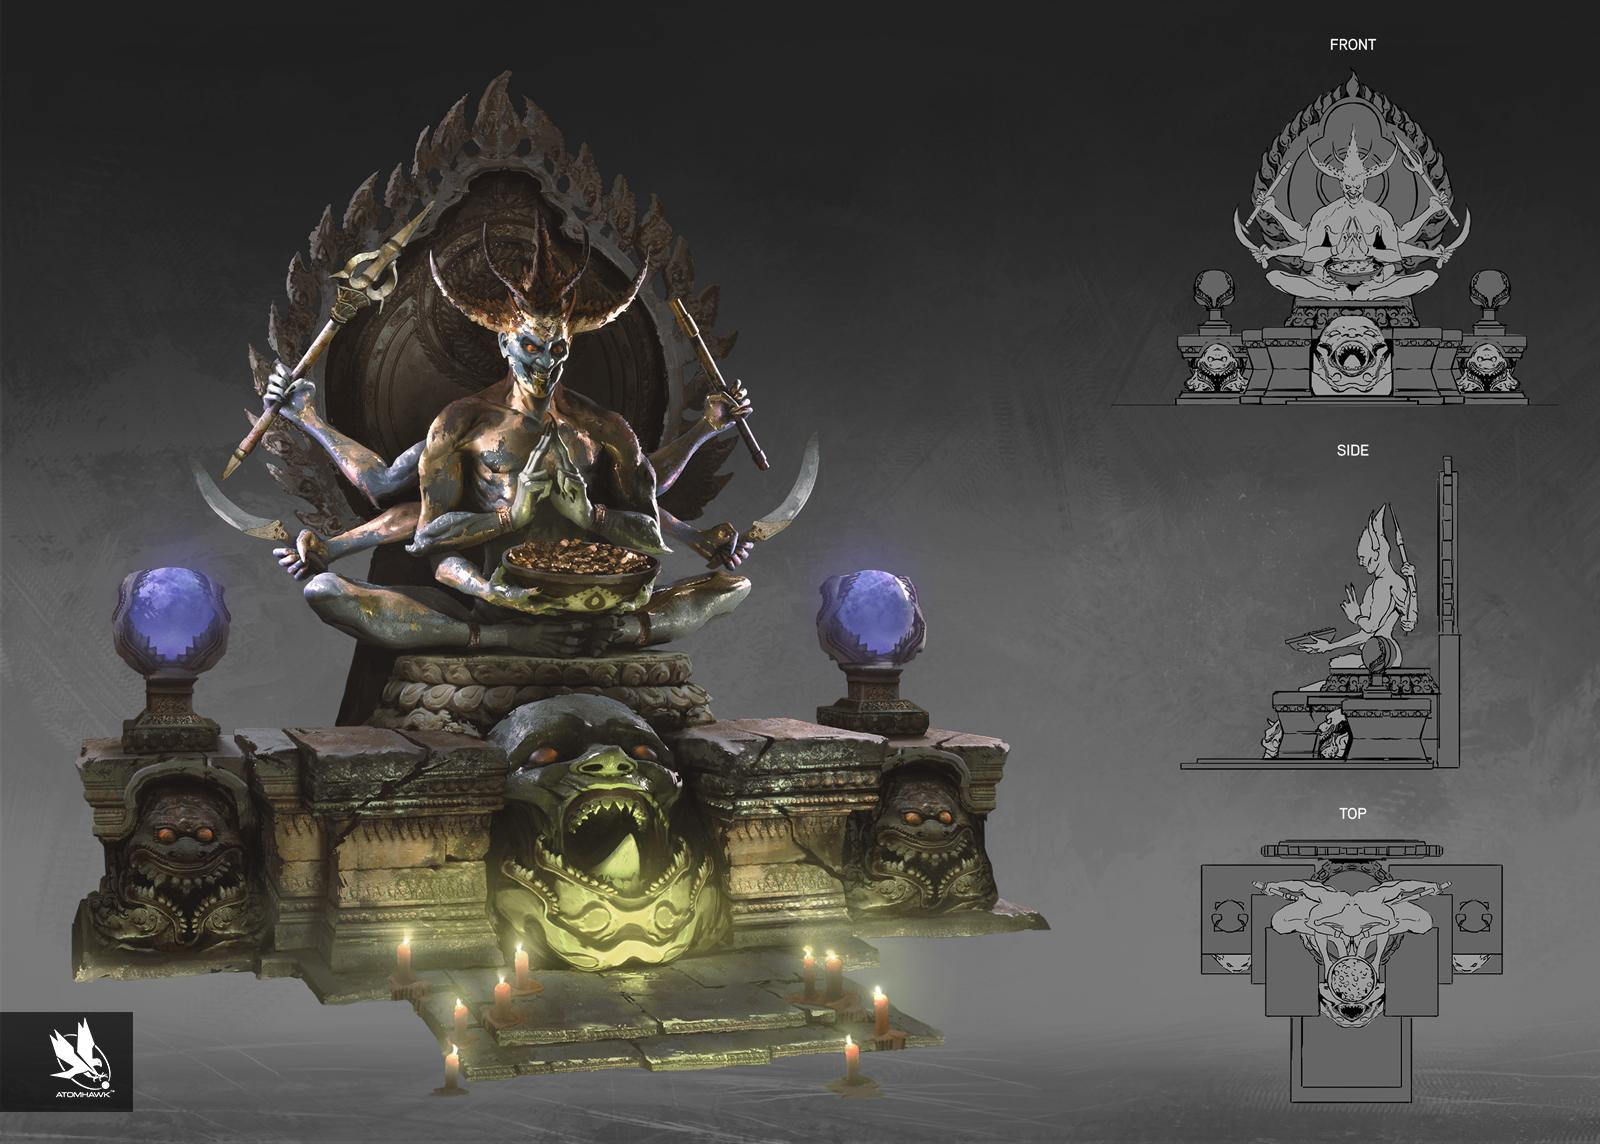 Atomhawk_Warner-Bros-NetherRealm_Mortal-Kombat-11_Concept-Art_Prop-Design_Forge_Breakout.jpg